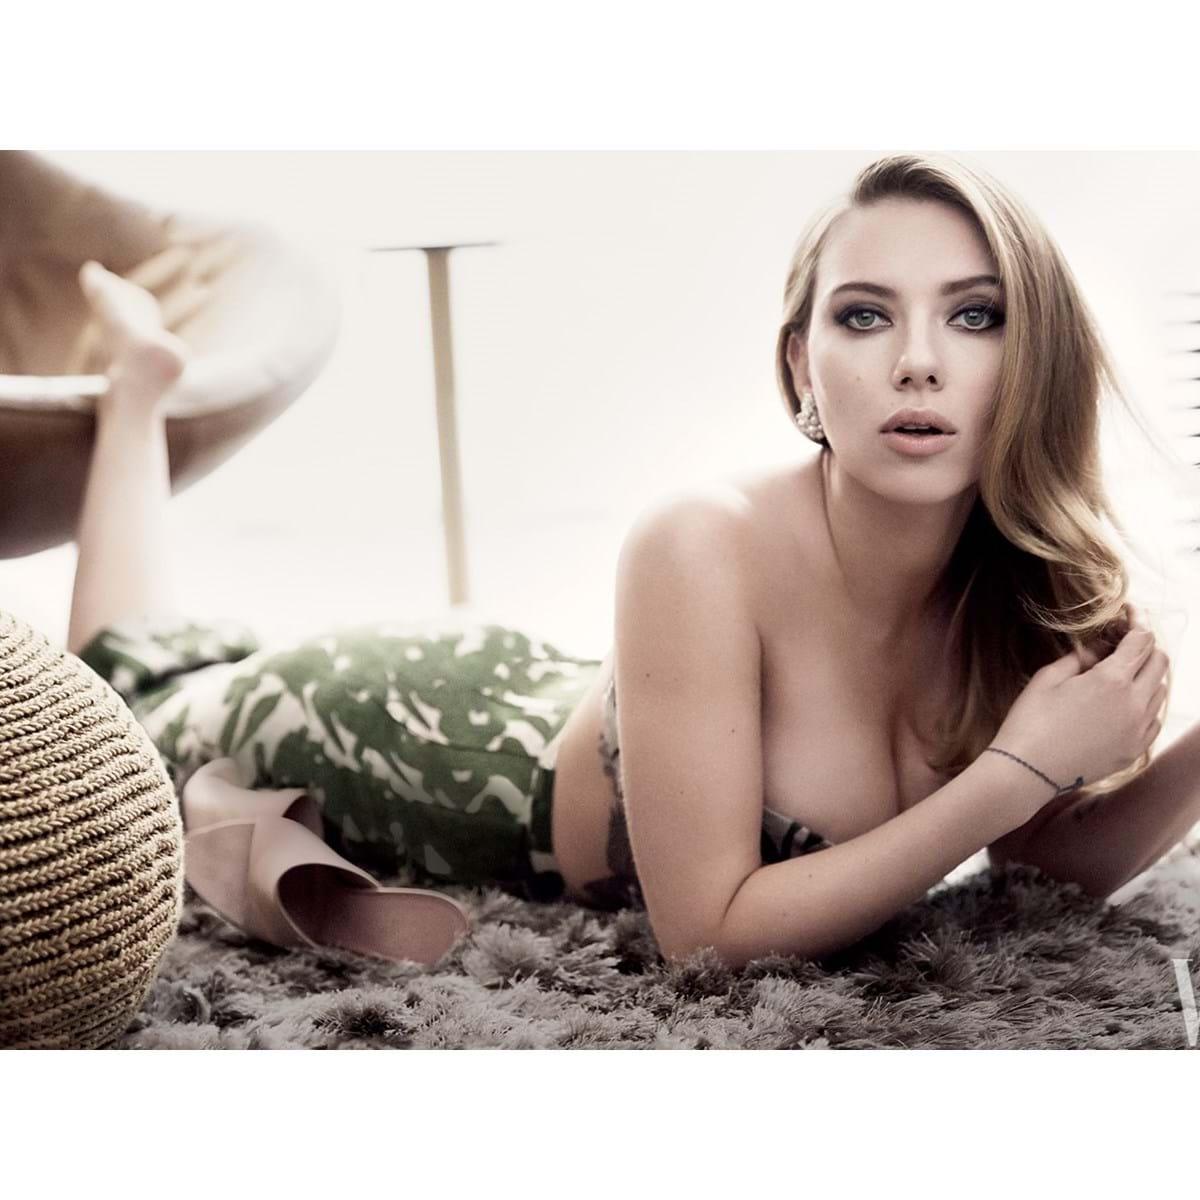 Scarlett Johansson ataca Ivanka Trump - Mundo - FLASH!